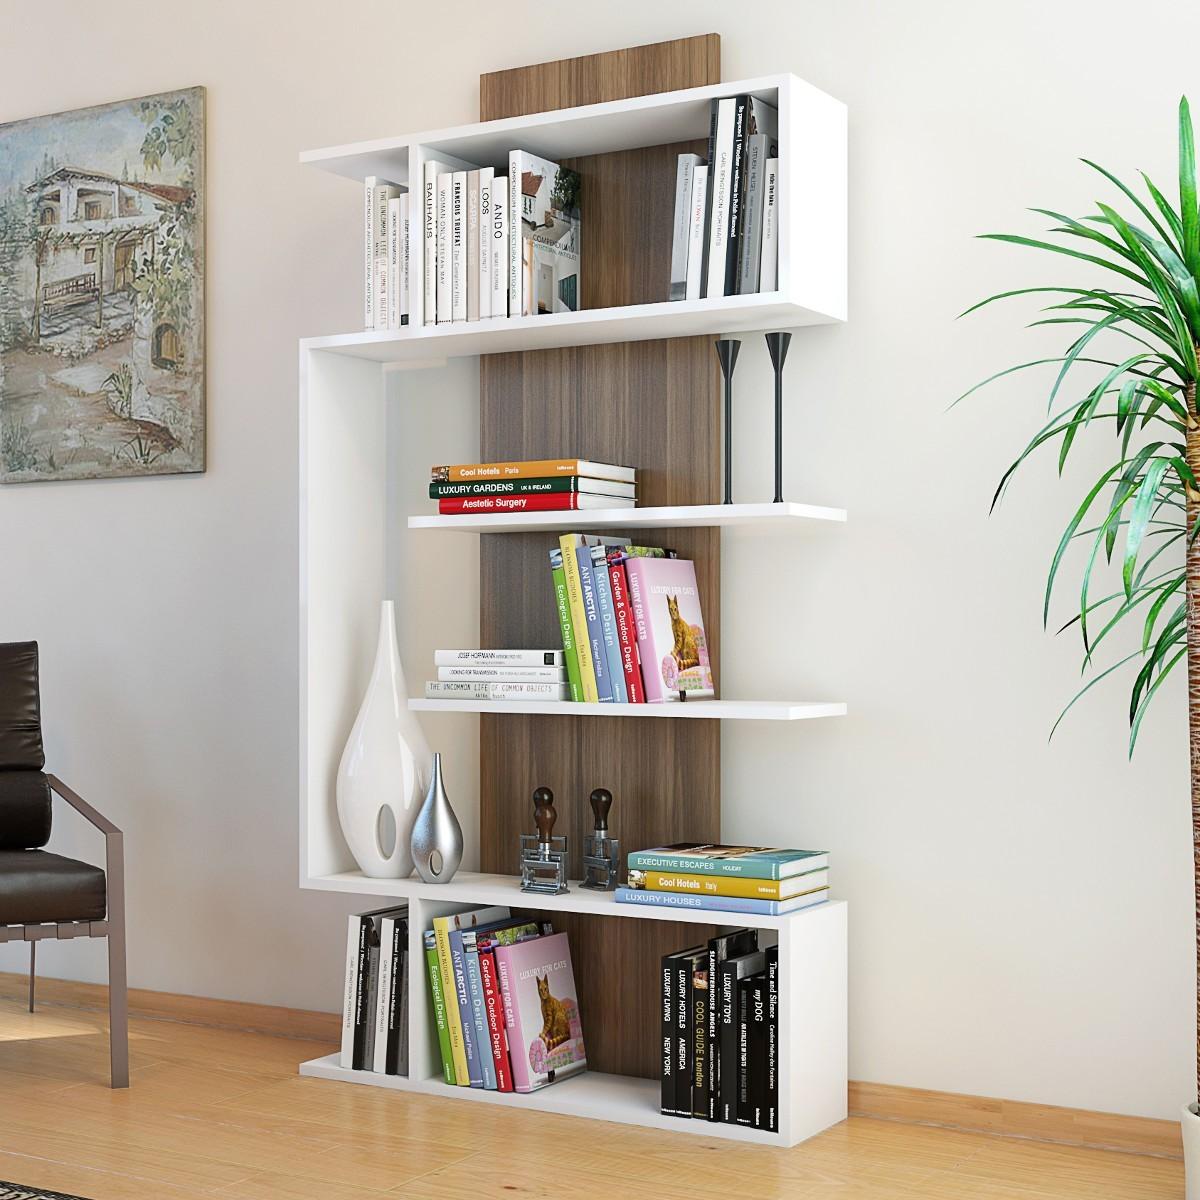 Beryl libreria da soggiorno moderna Bianco Noce 90 x 170 cm